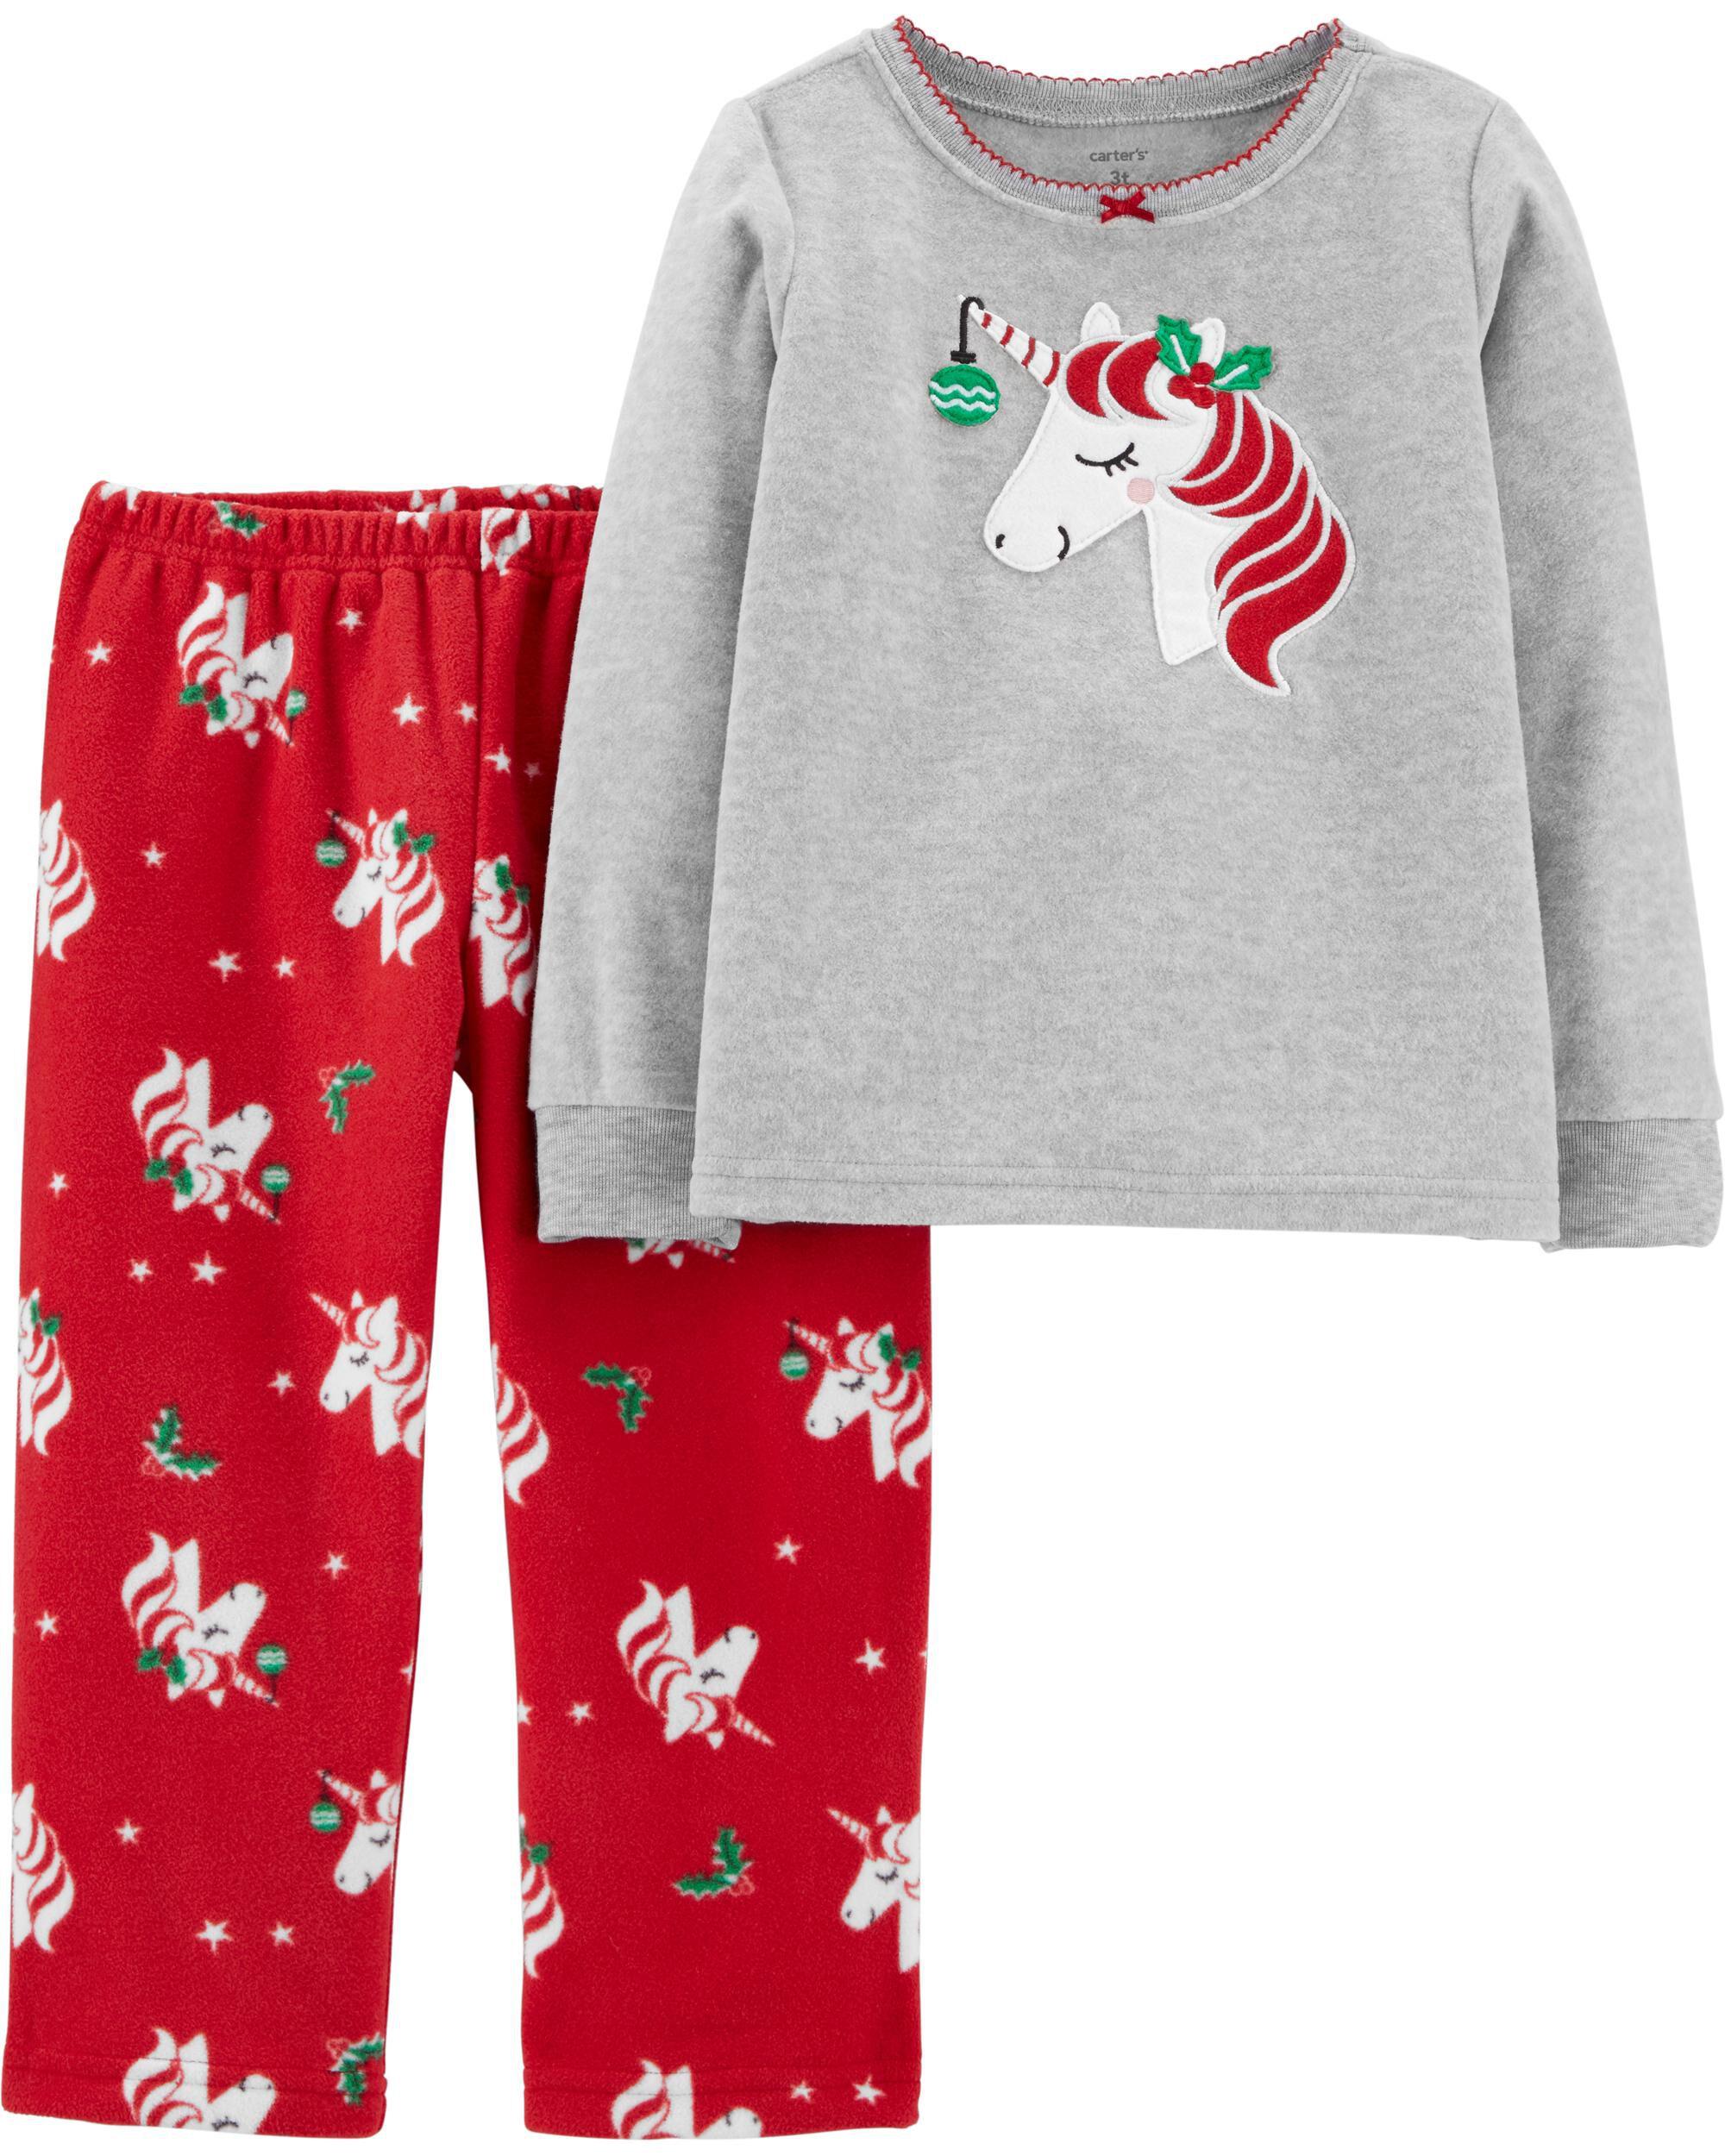 2-Piece Christmas Unicorn Fleece PJs